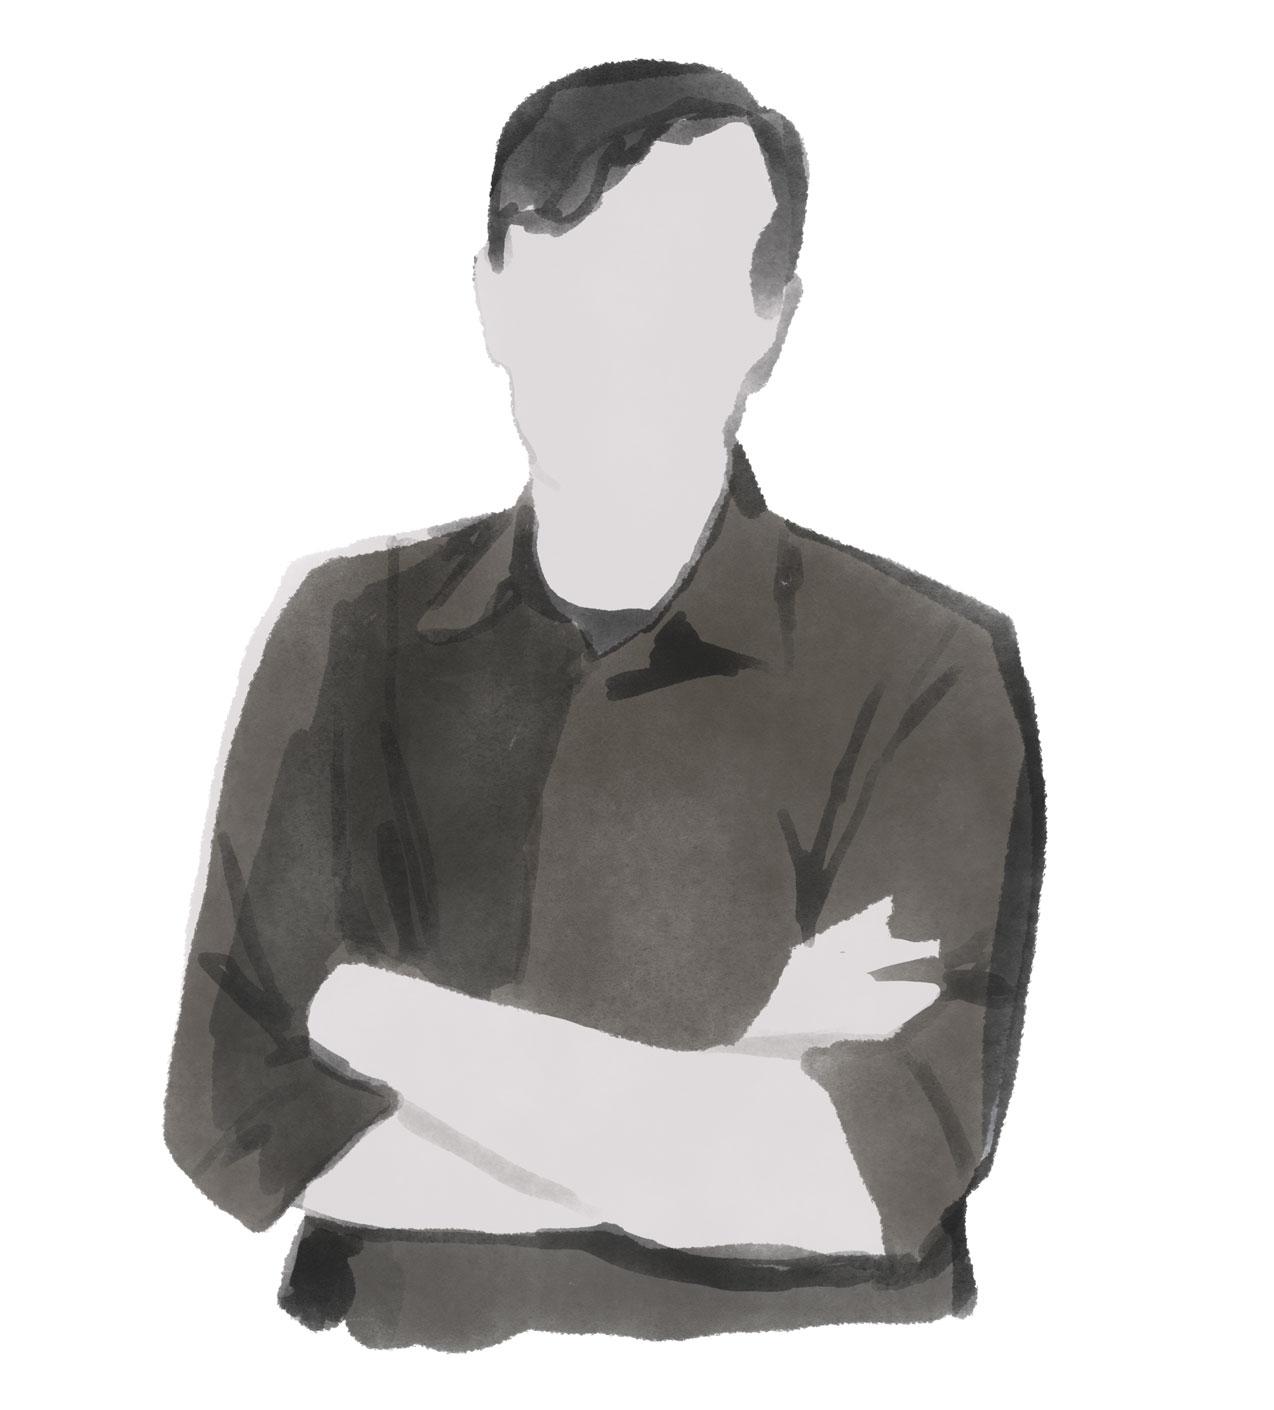 Portrait Illustration des Modeillustrators Mats Gustafson schwarz weiss tinte